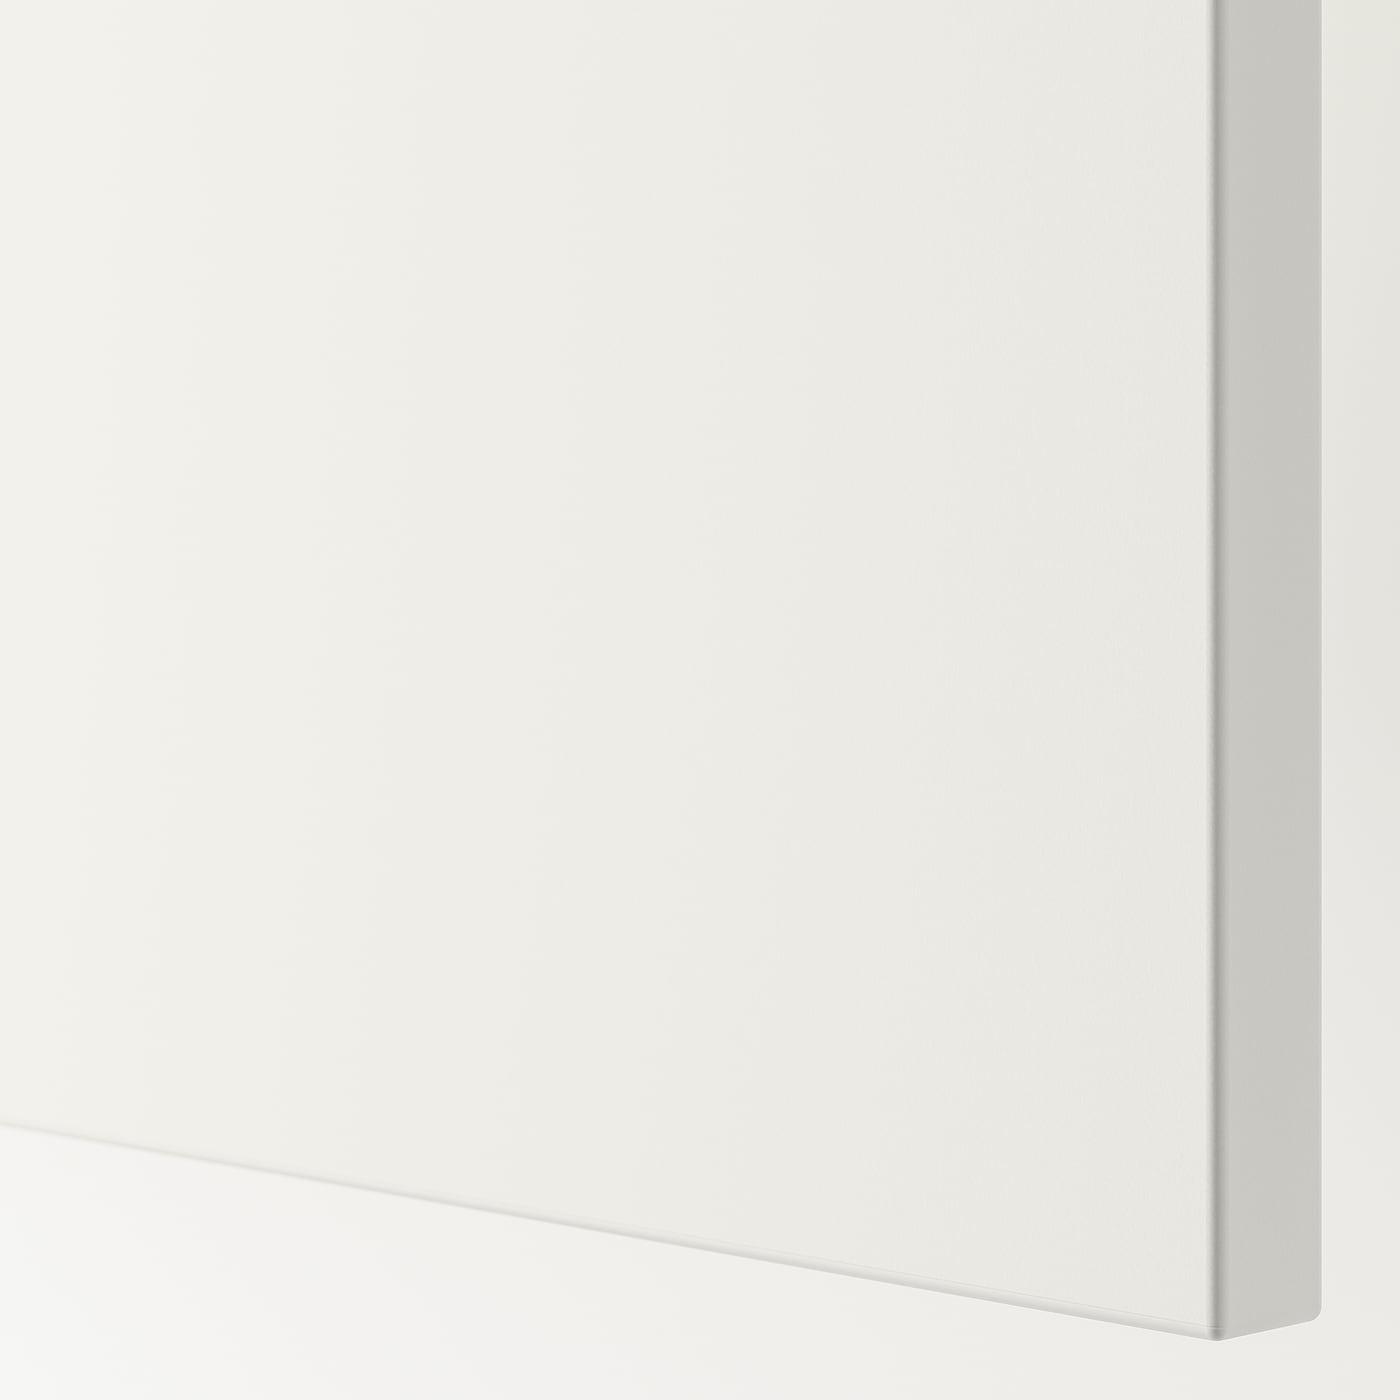 FONNES Tür weiß 40 cm 60 cm 1.6 cm